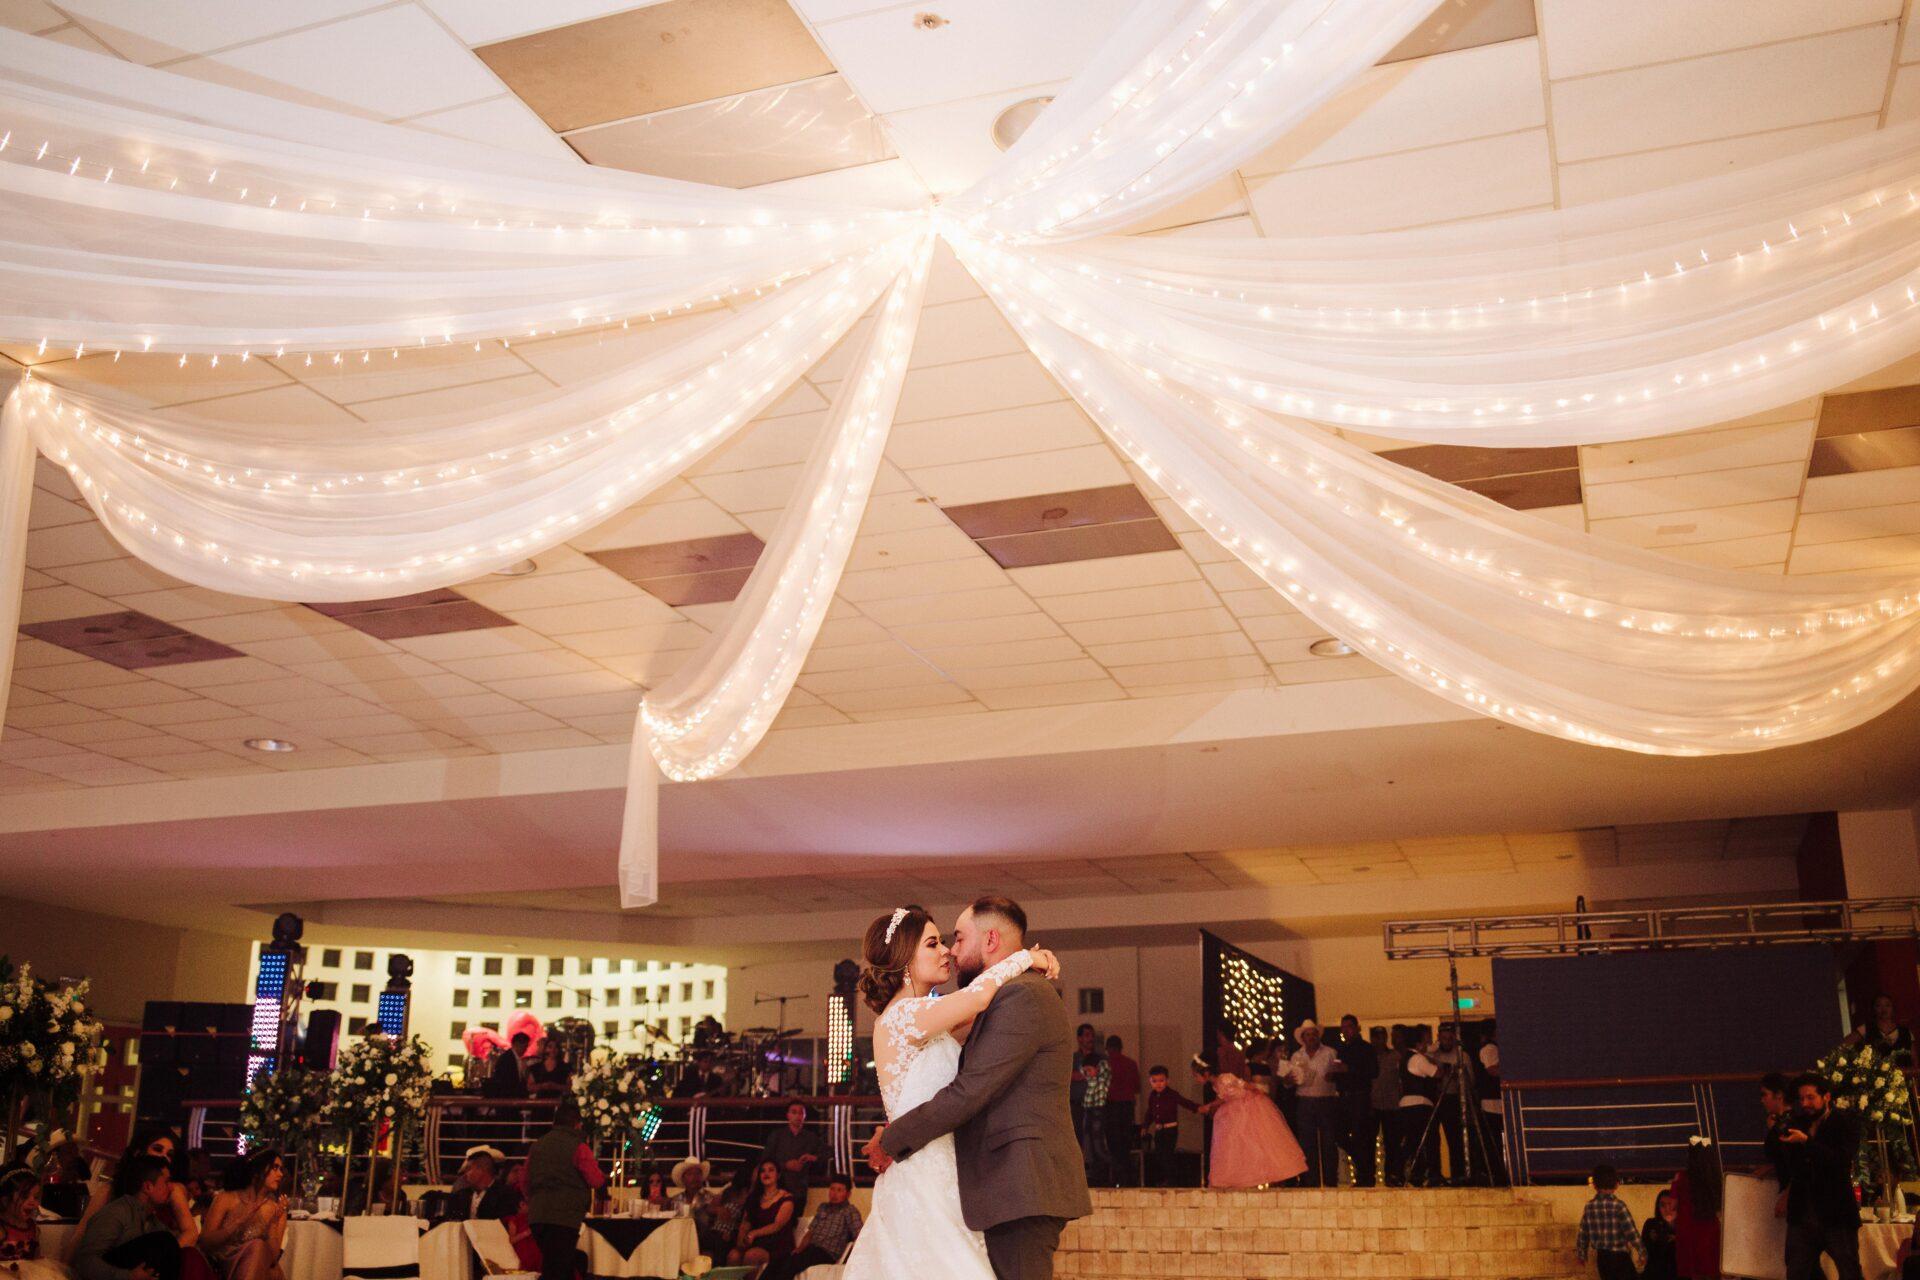 javier_noriega_fotografo_bodas_zacatecas_fresnillo_chihuahua_wedding_photographer24